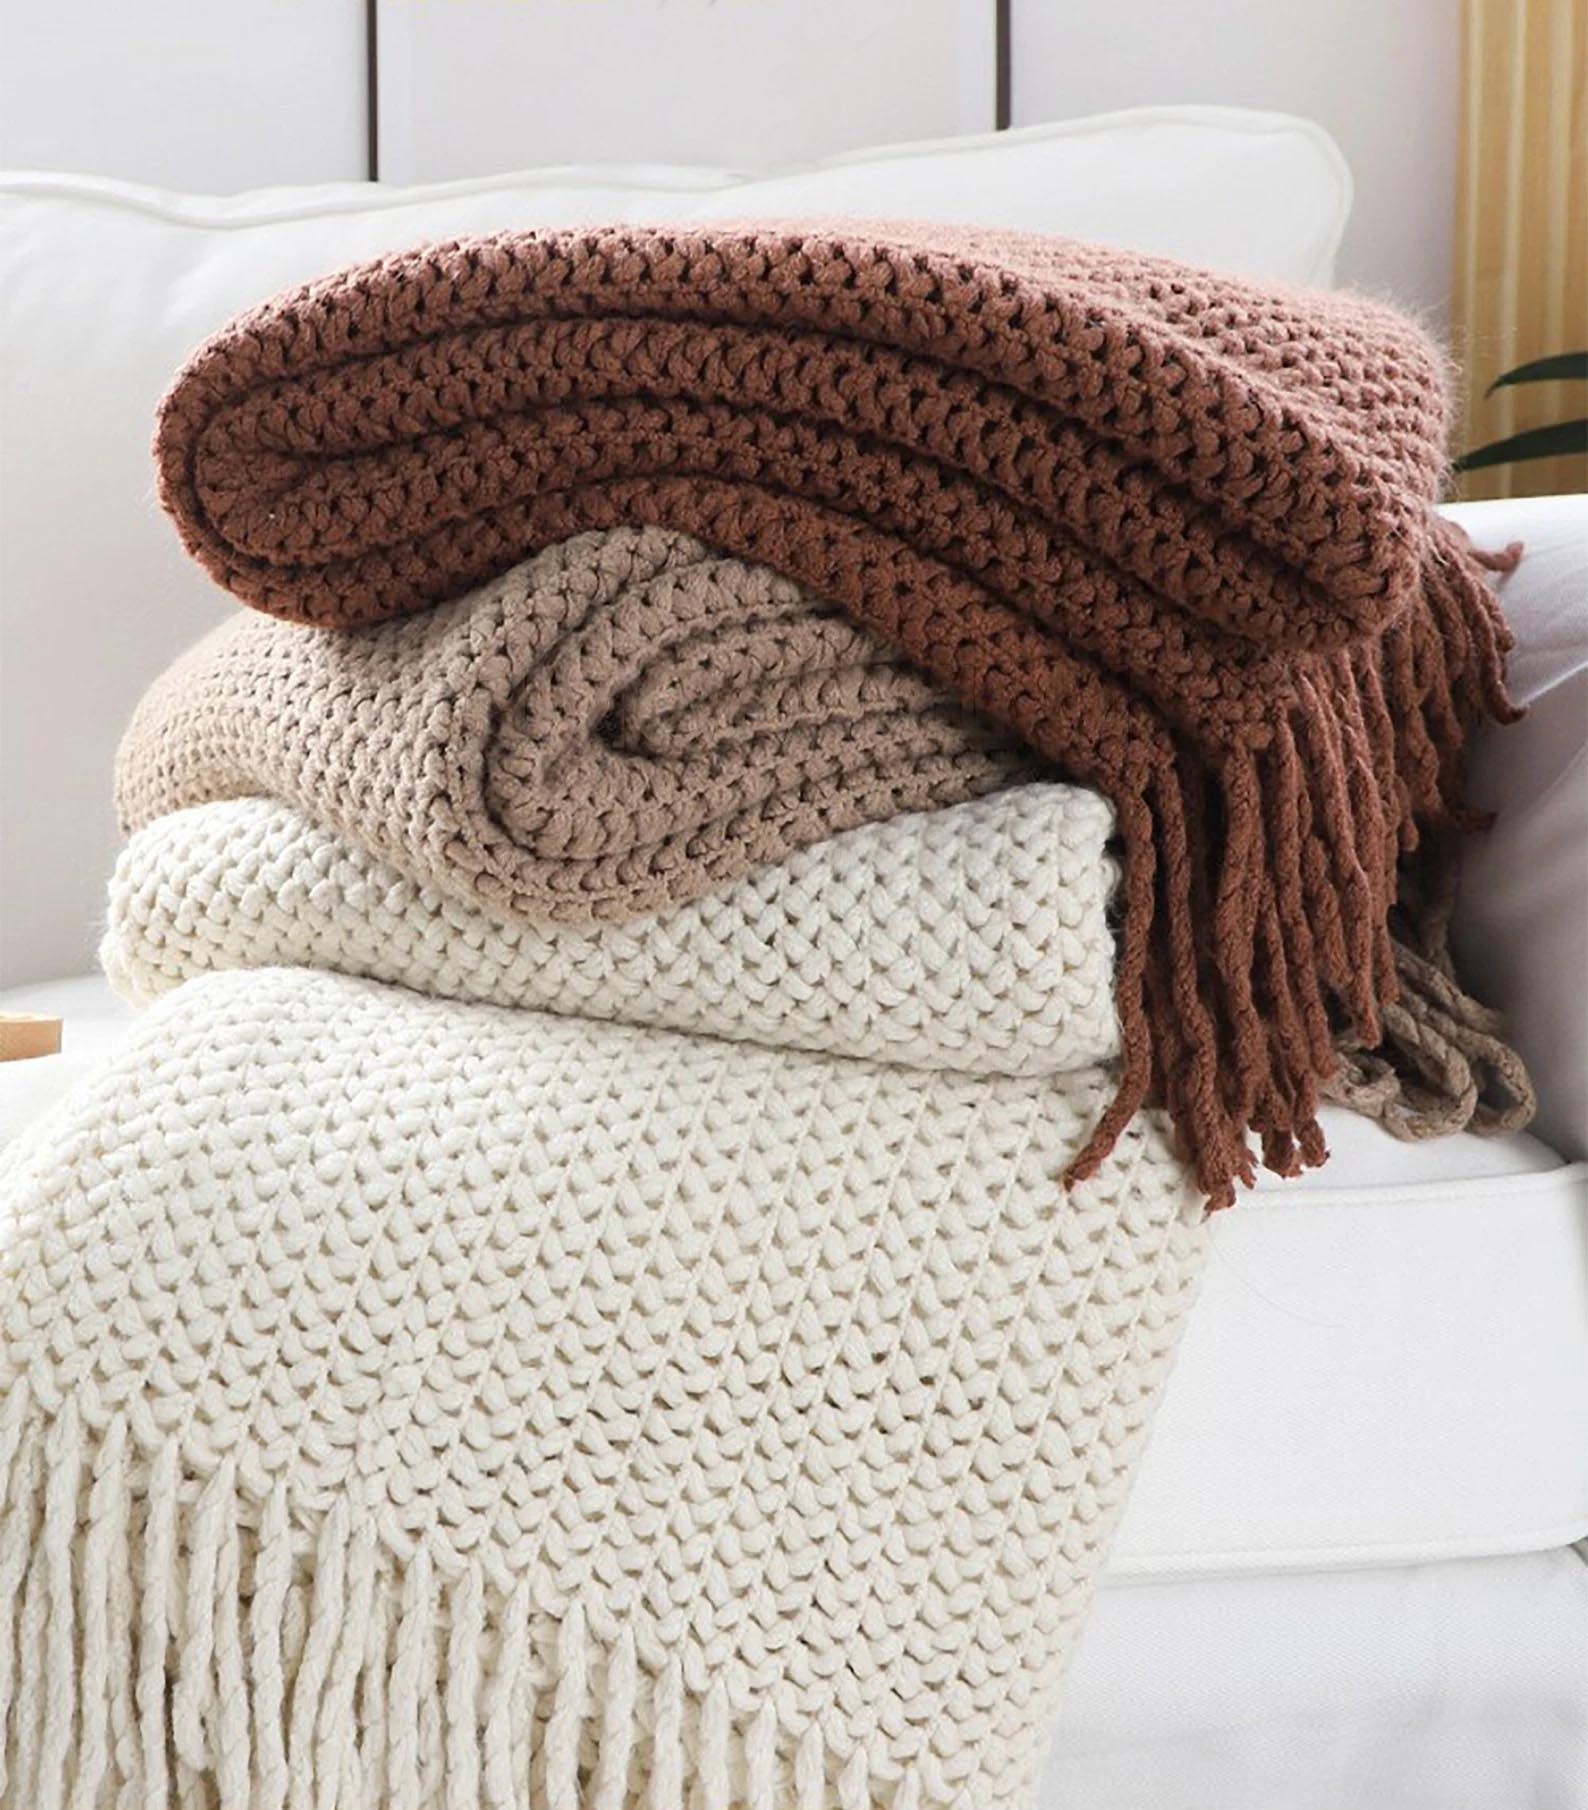 Modern Fall Decor Ideas - Criss-Cross Knited Throw Blanket.